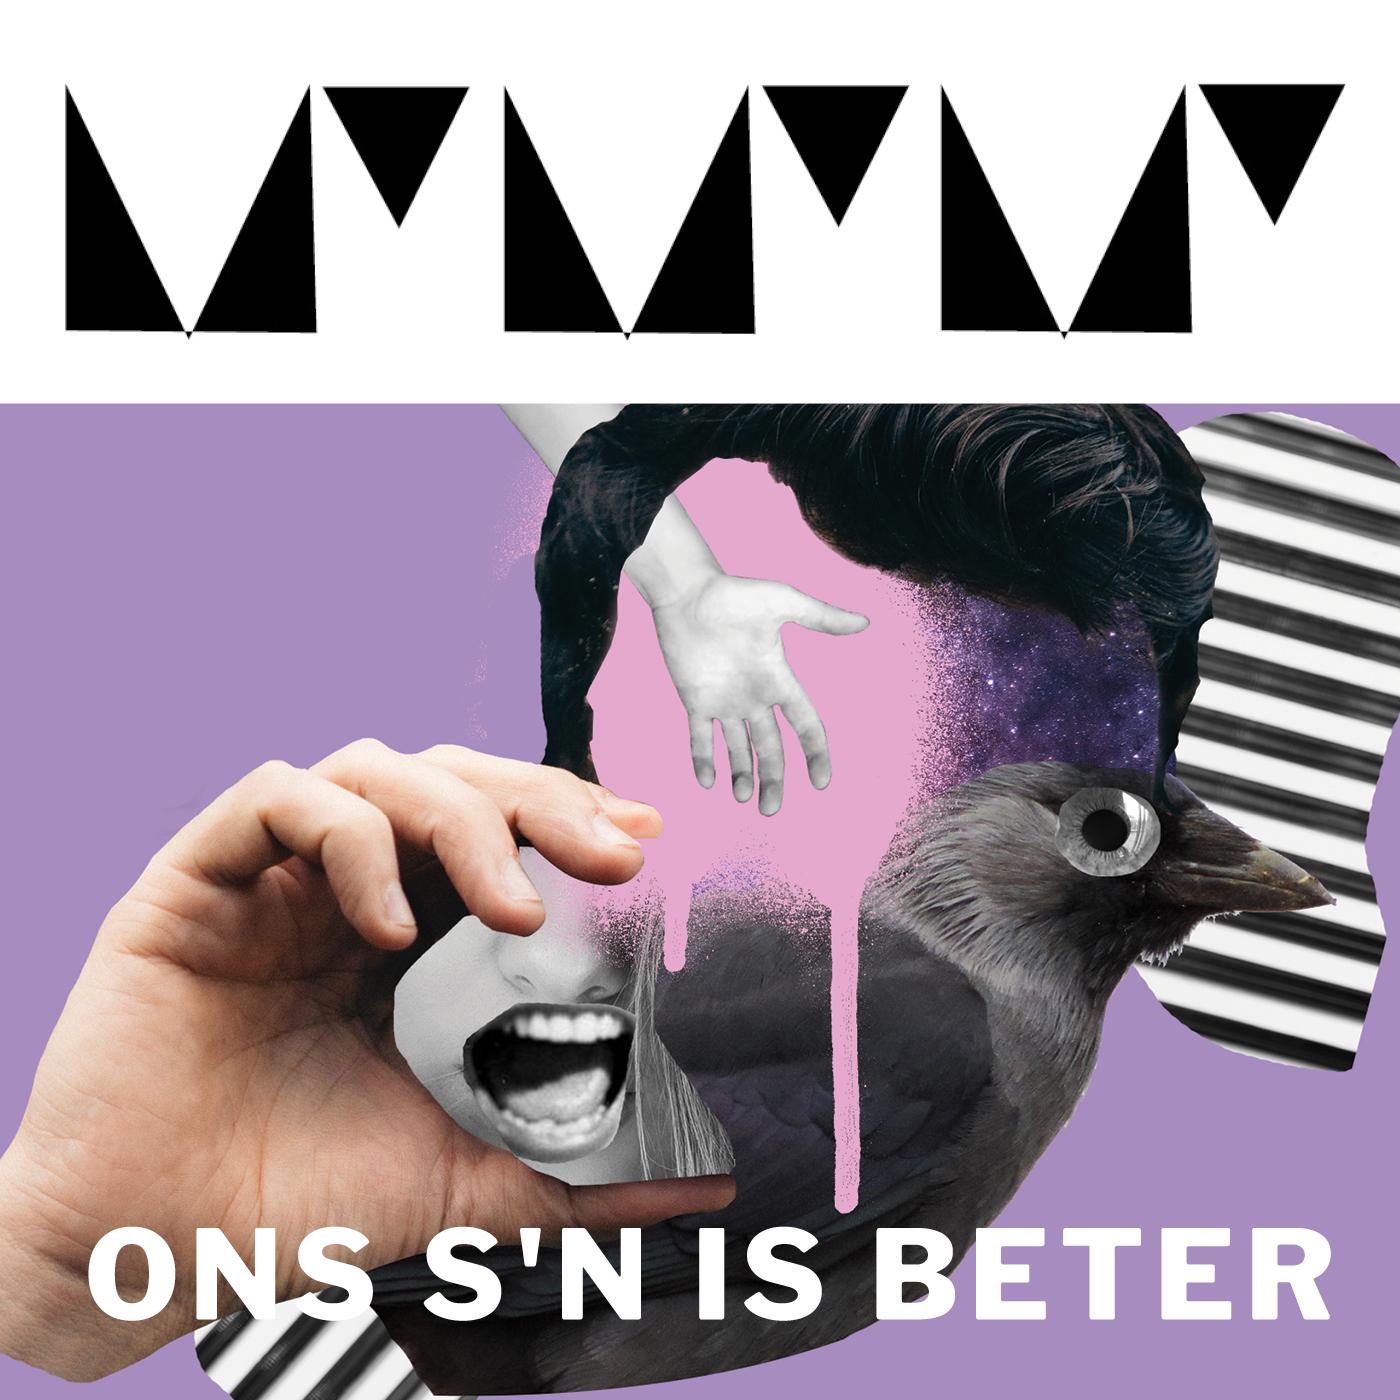 MYMYMY – A Bilingual synthpop enigma